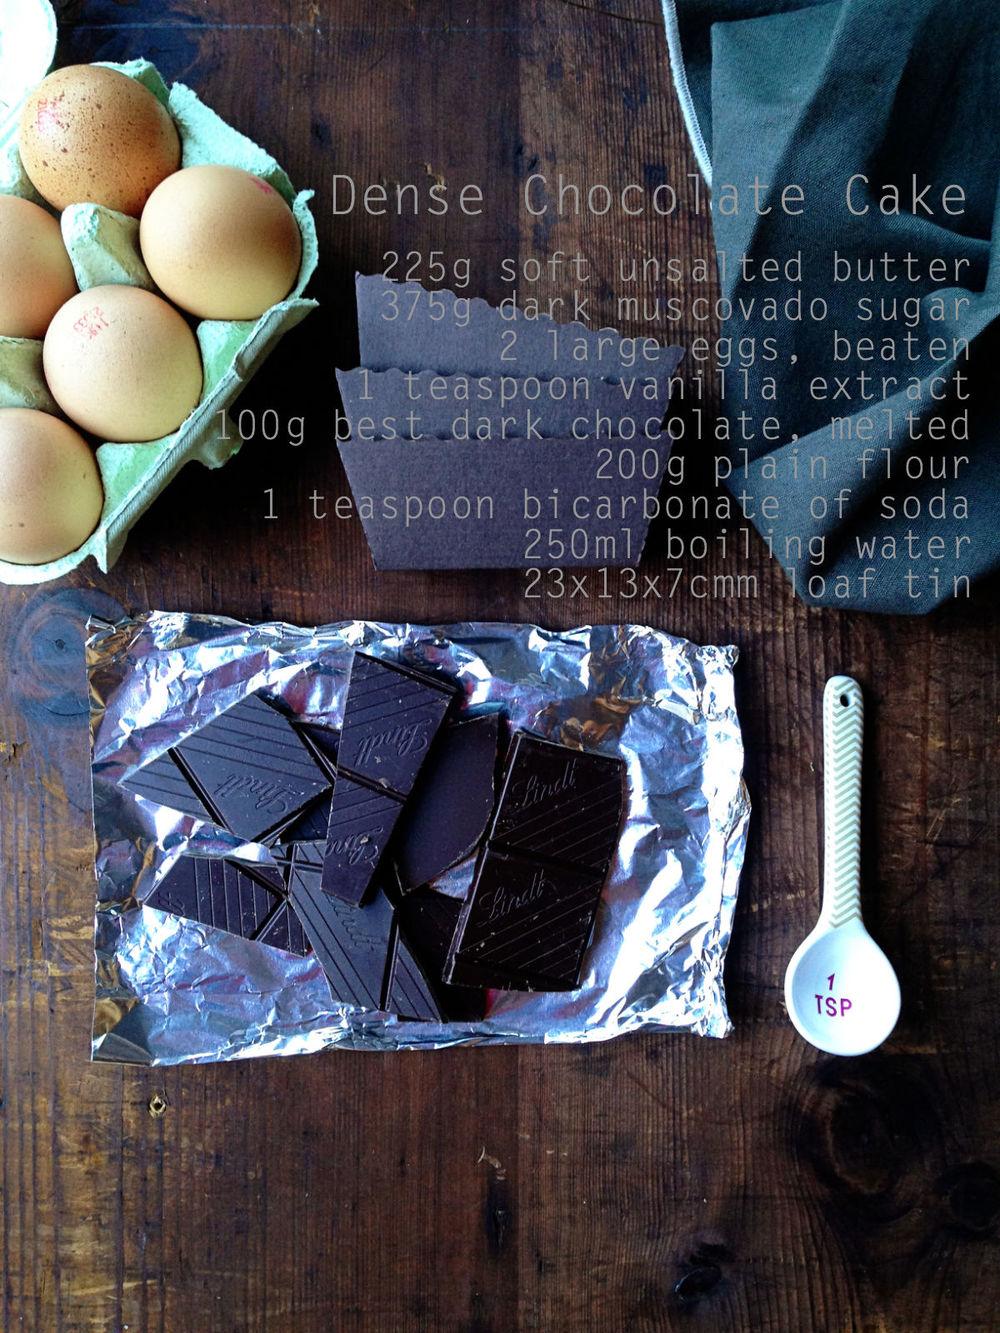 chocolatecake 003.jpg